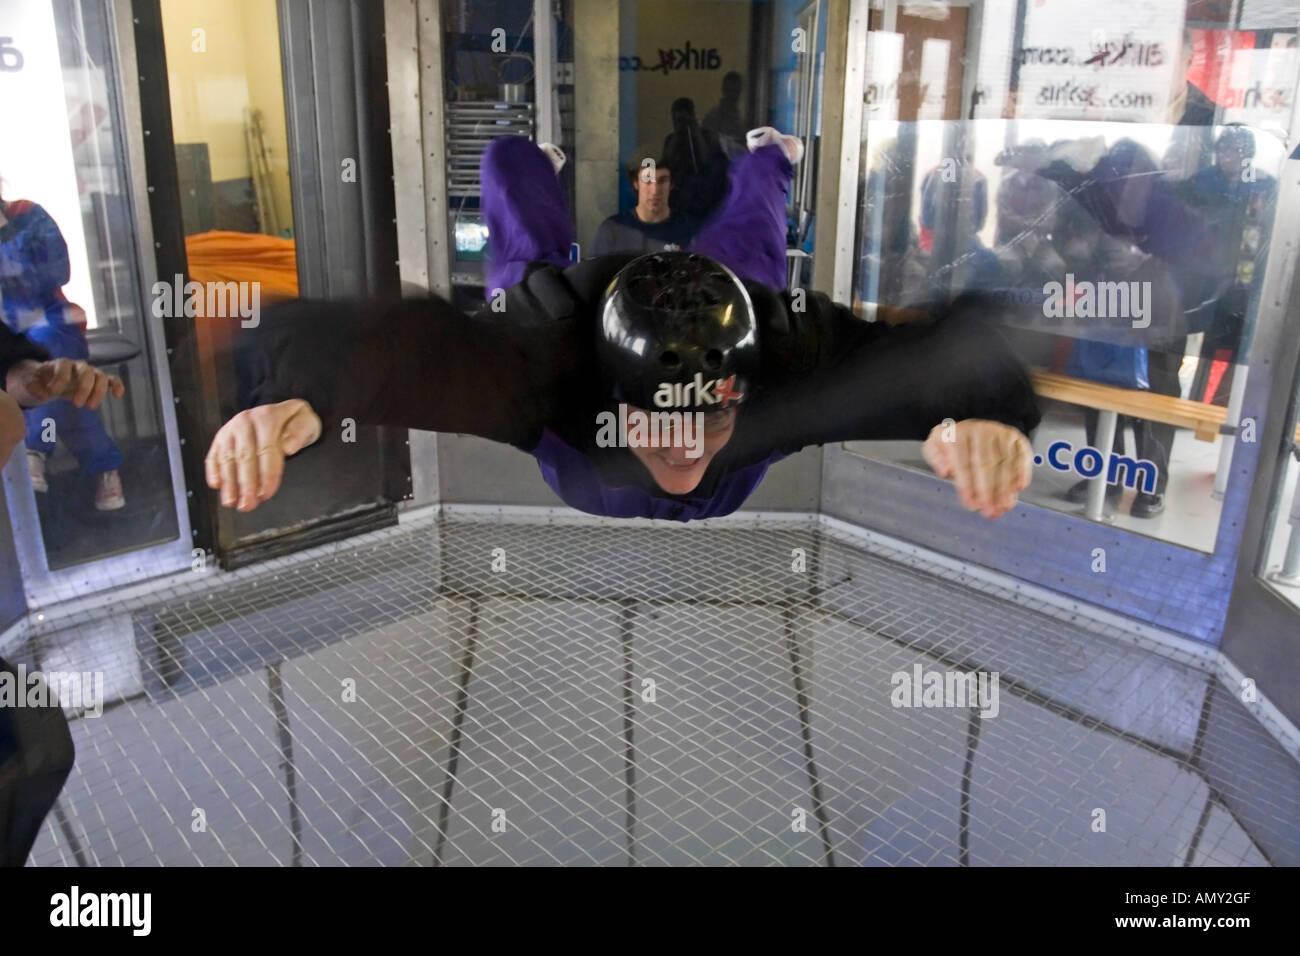 Airkix Indoor skydiving xscape milton keynes - Stock Image